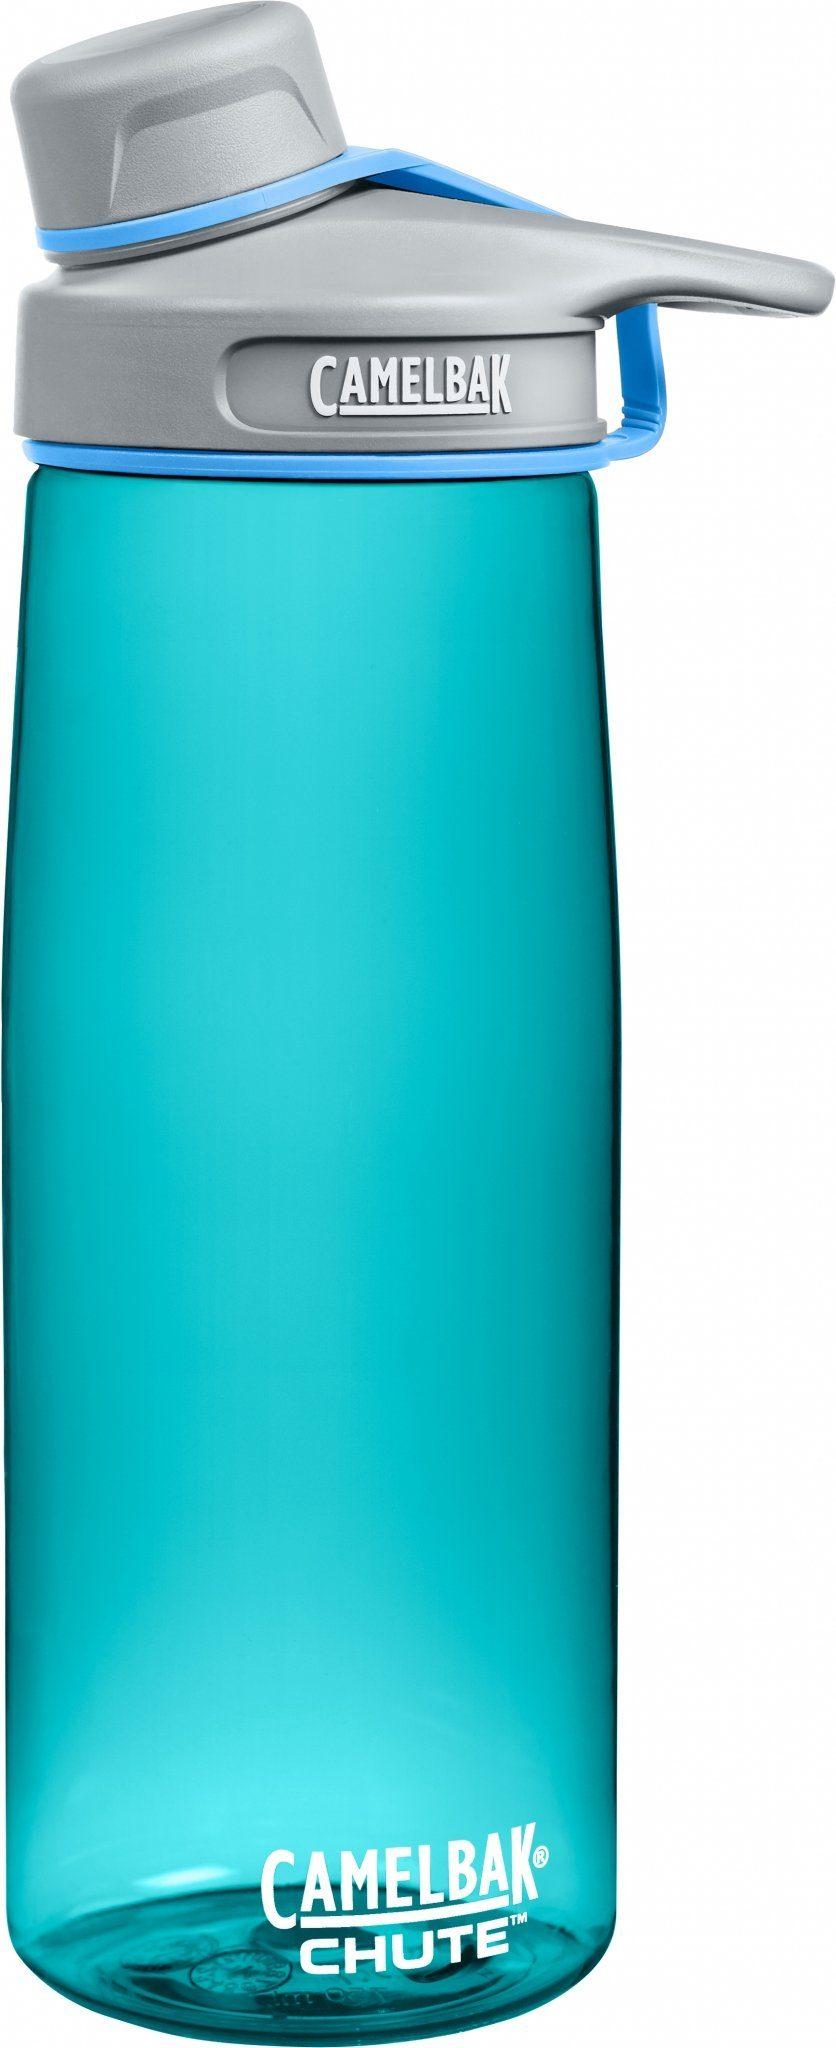 Camelbak Trinkflasche »Chute Trinkflasche 750ml«